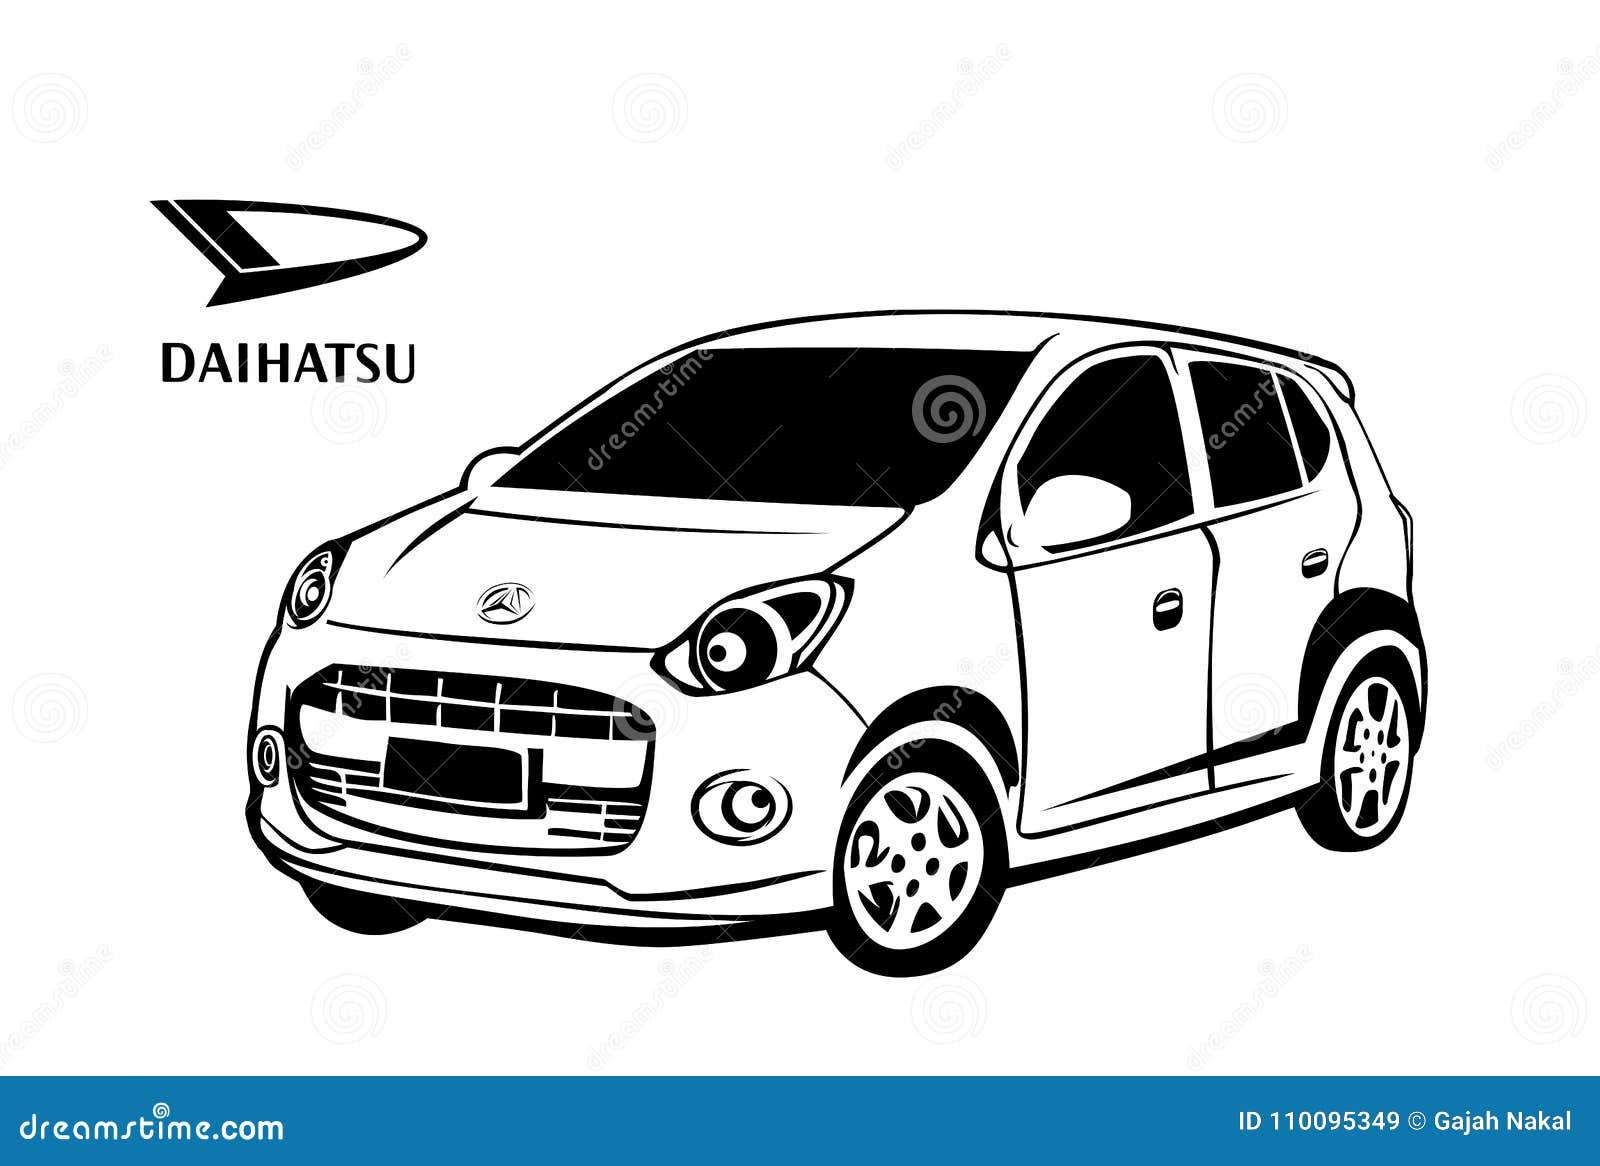 daihatsu car vector design editorial stock image  illustration of costum